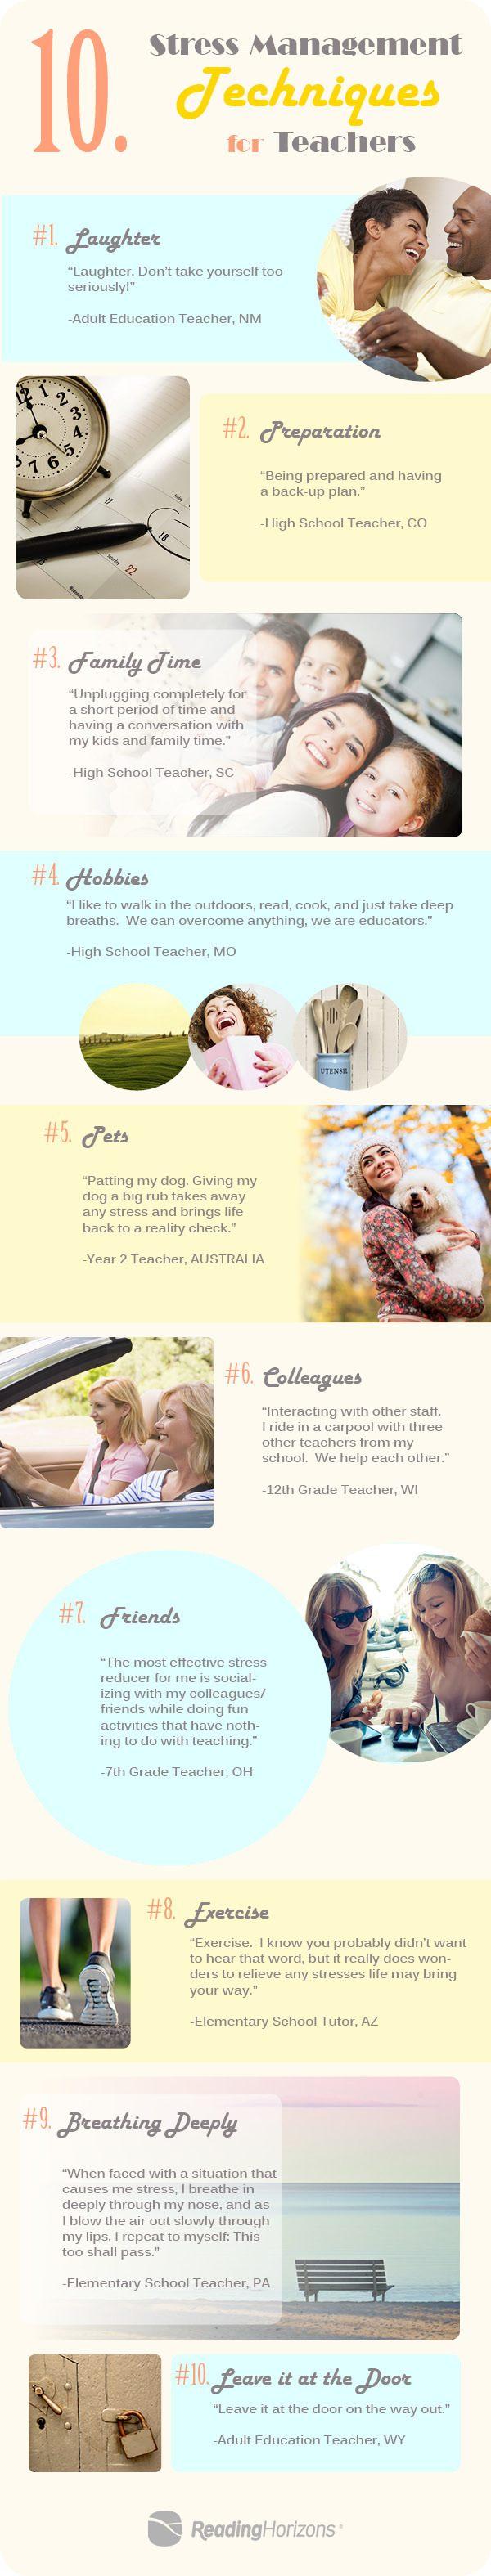 10 Stress-Management Techniques for Teachers Infographic